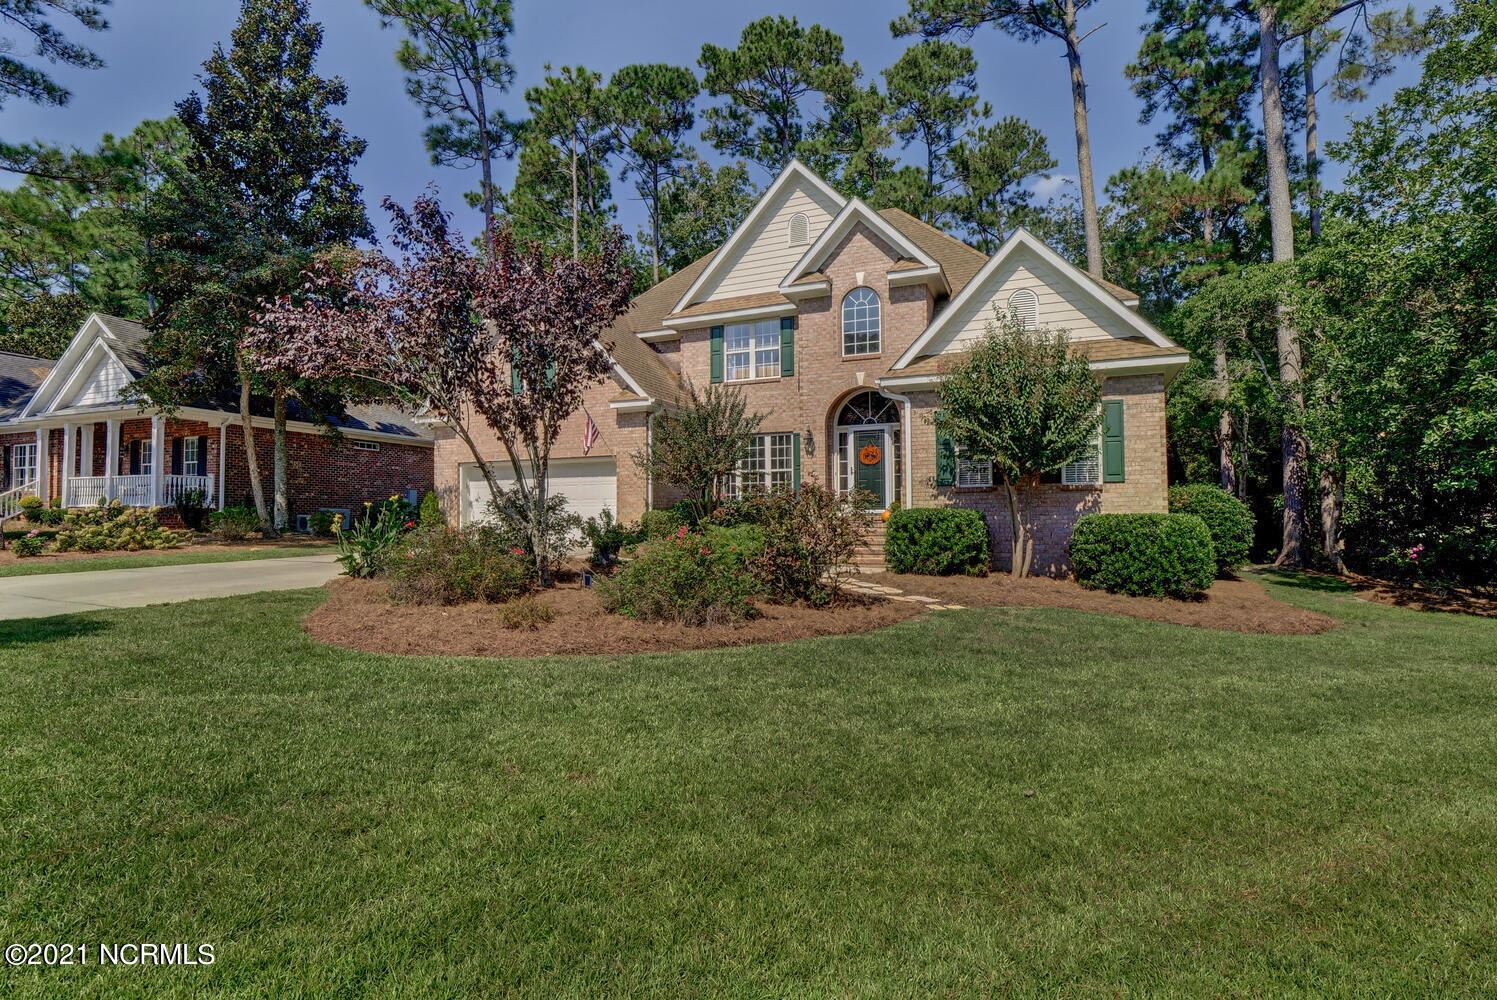 Photo of 5019 Godfrey Way, Wilmington, NC 28409 (MLS # 100293283)